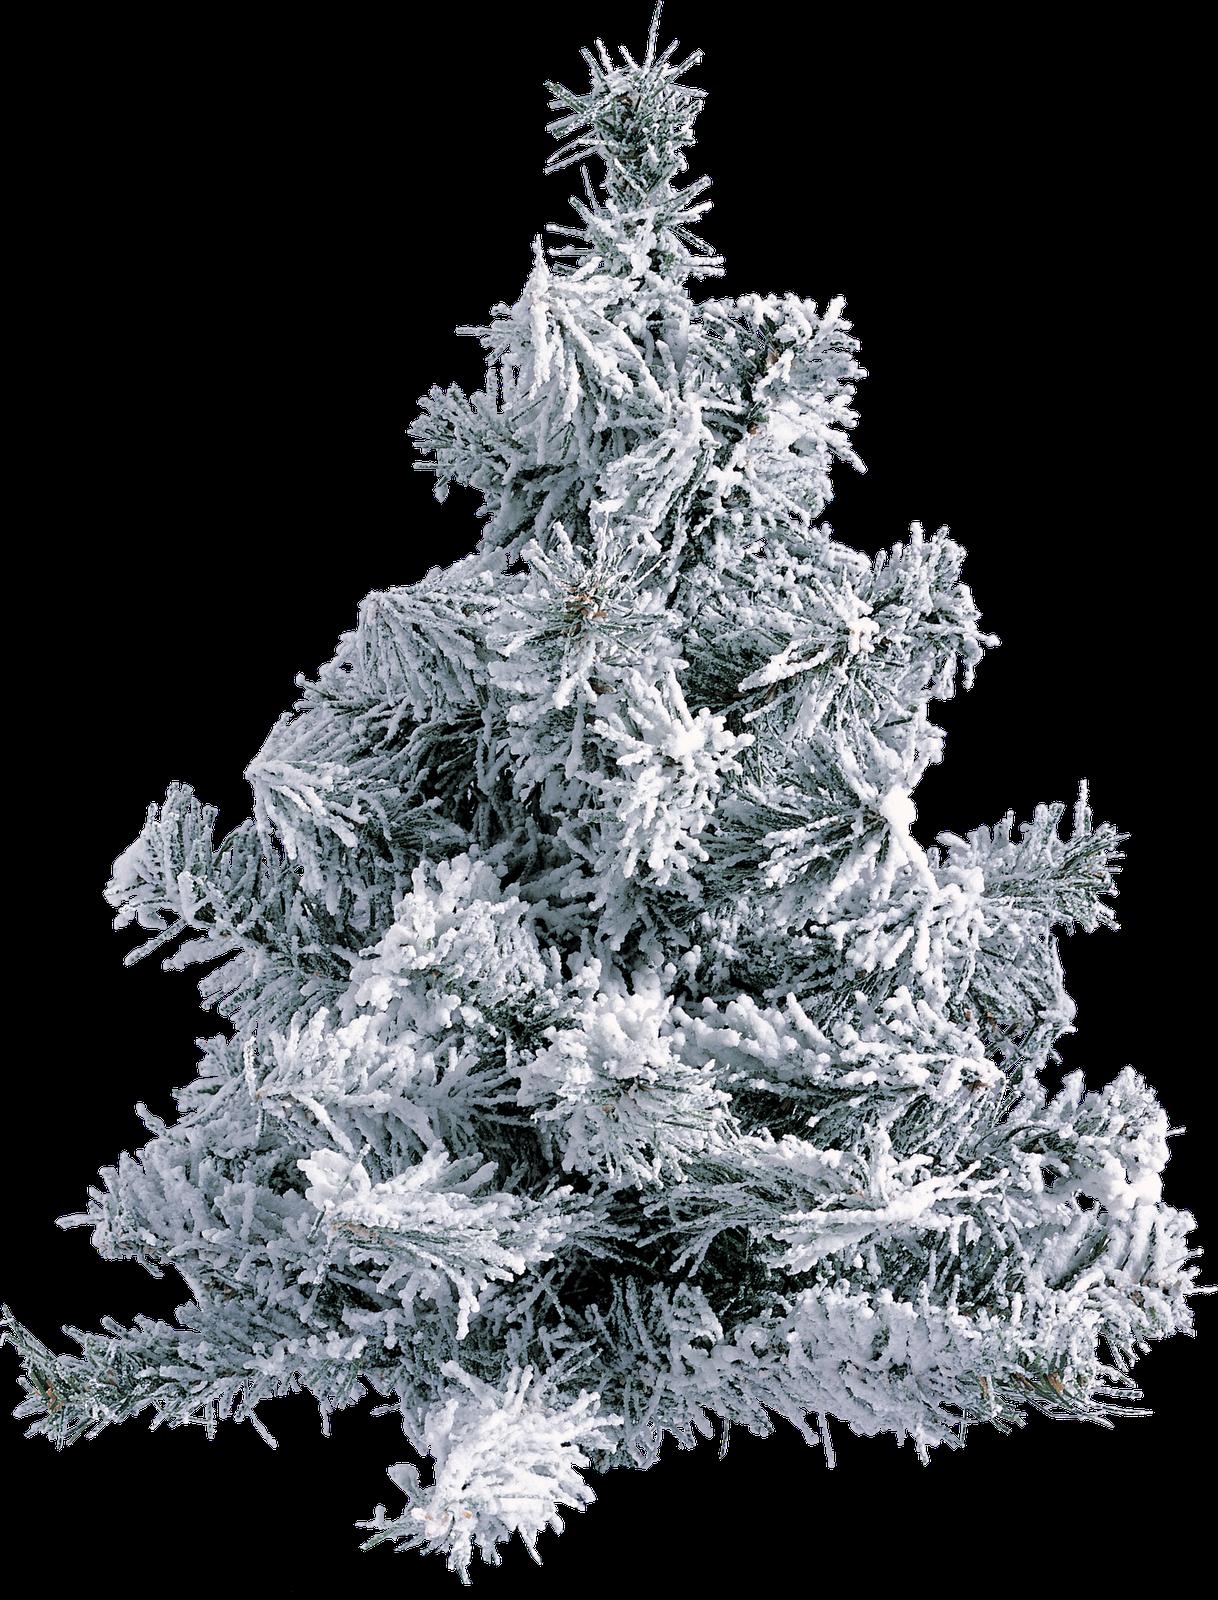 Feliz a o nuevo 2013 happy new year 2013 decoraci n - Arbol navidad nieve ...